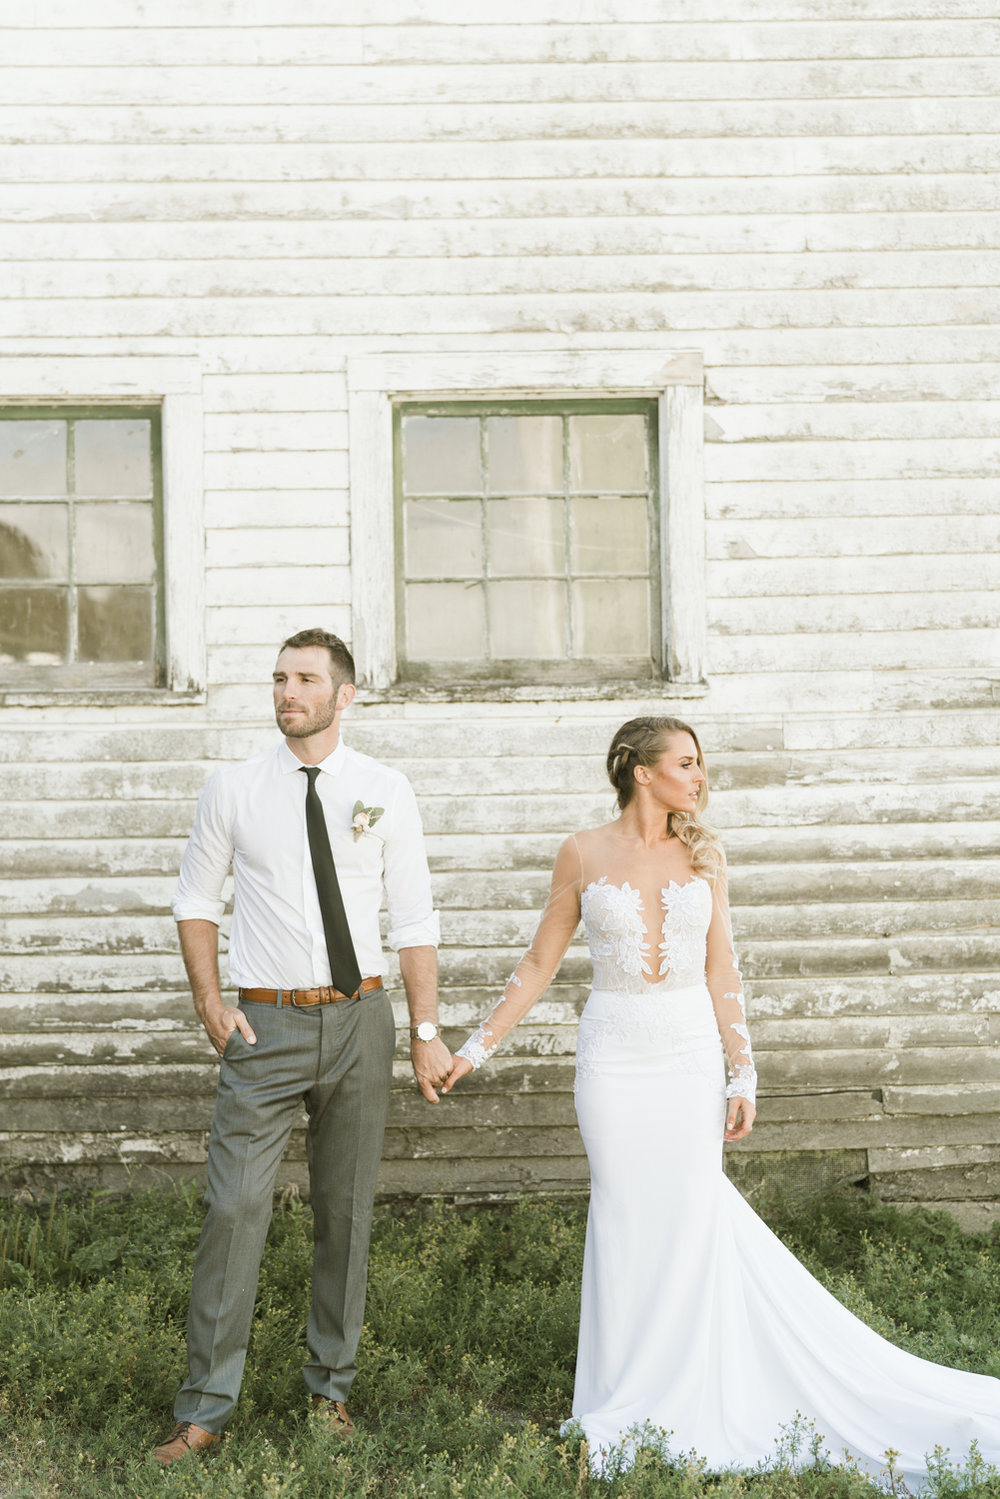 April Yentas Photography - South Bend Shoot-36.jpg